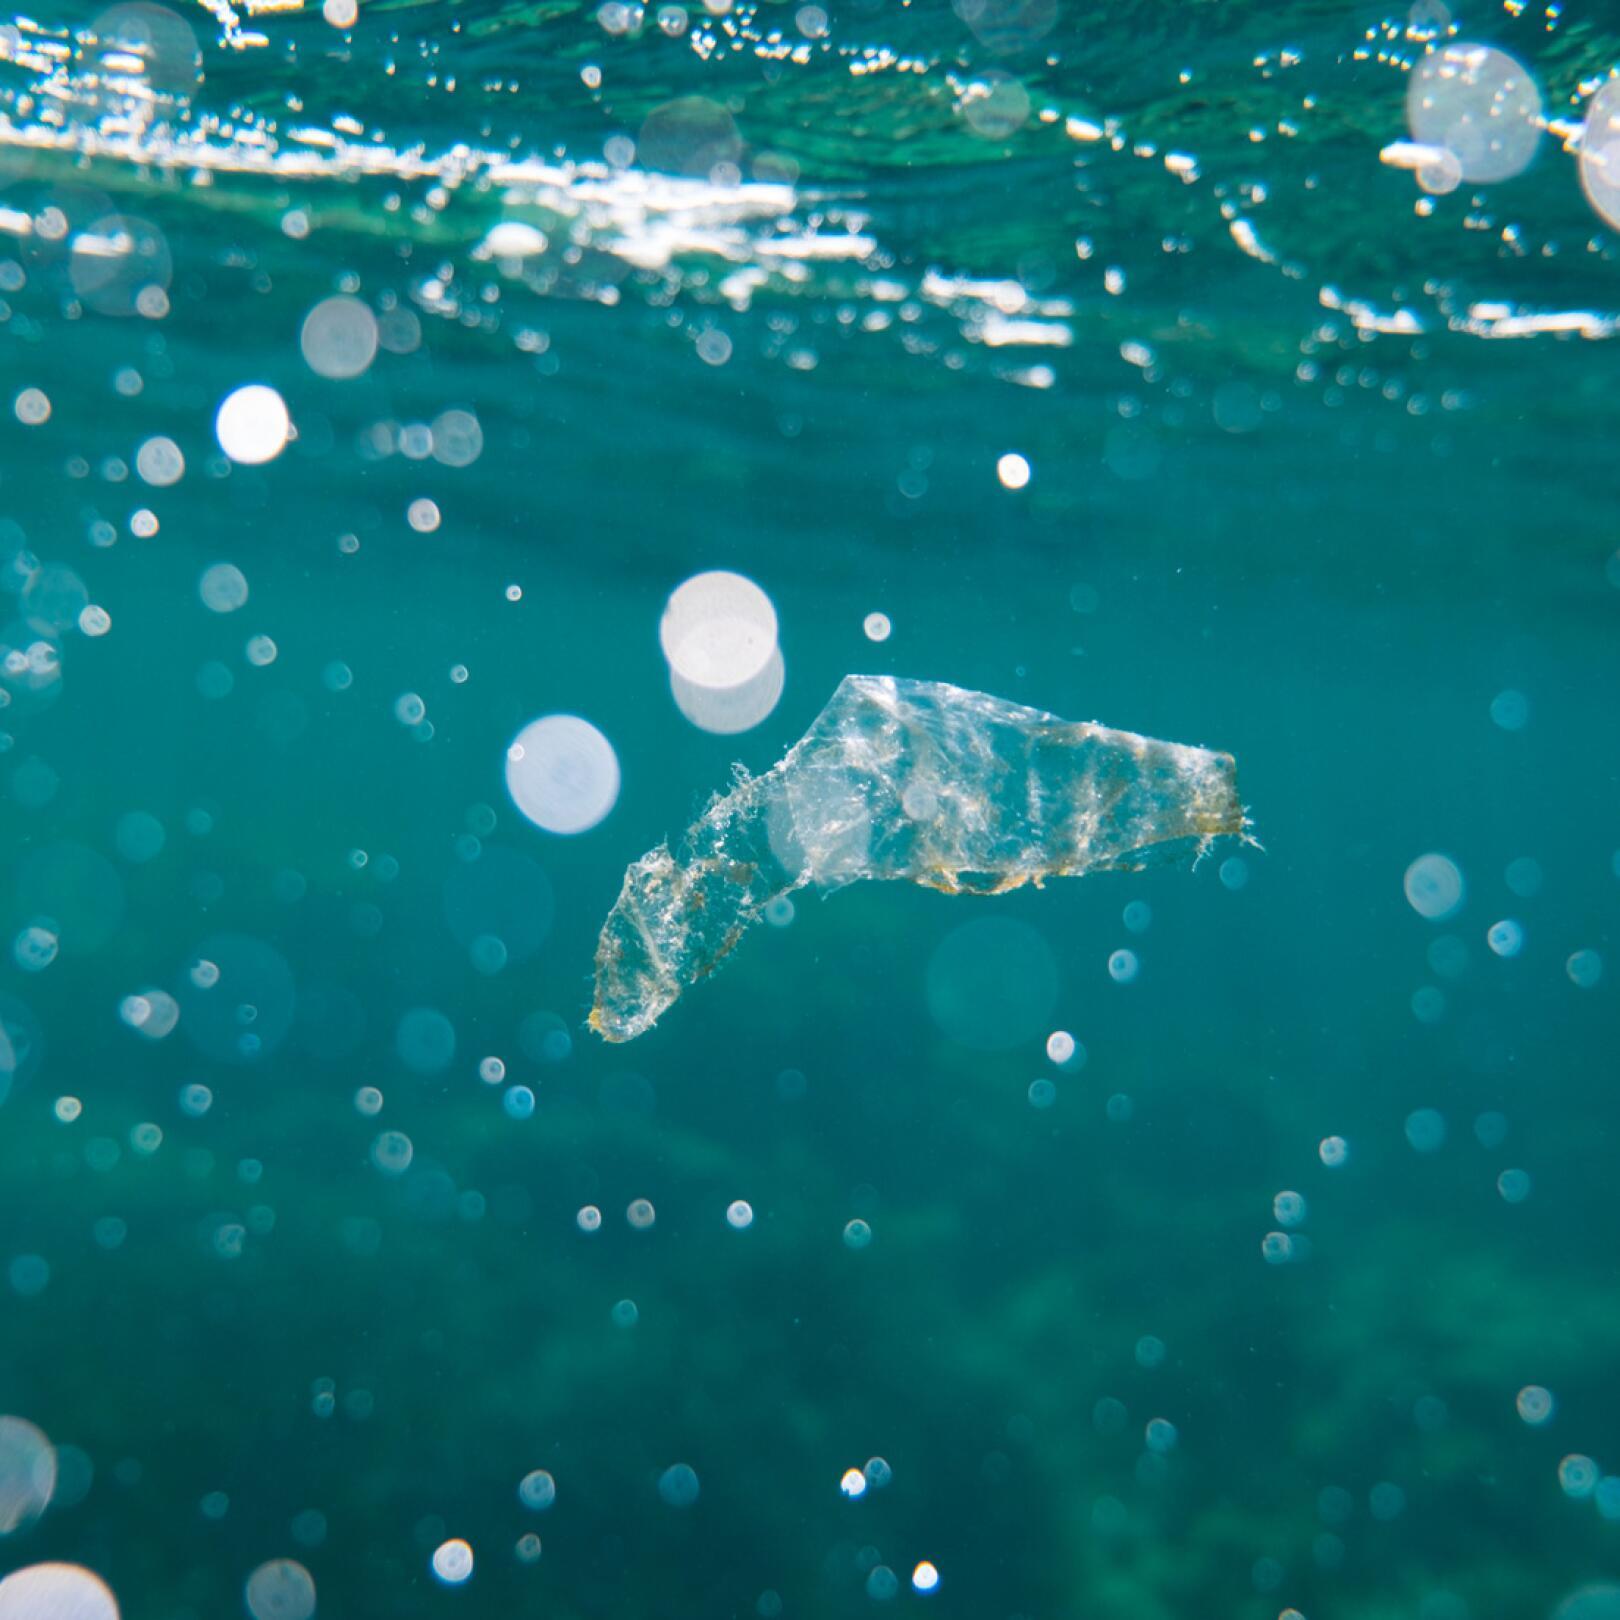 av_solaires_ingredients-toxiques_plastique_ocean_1x1